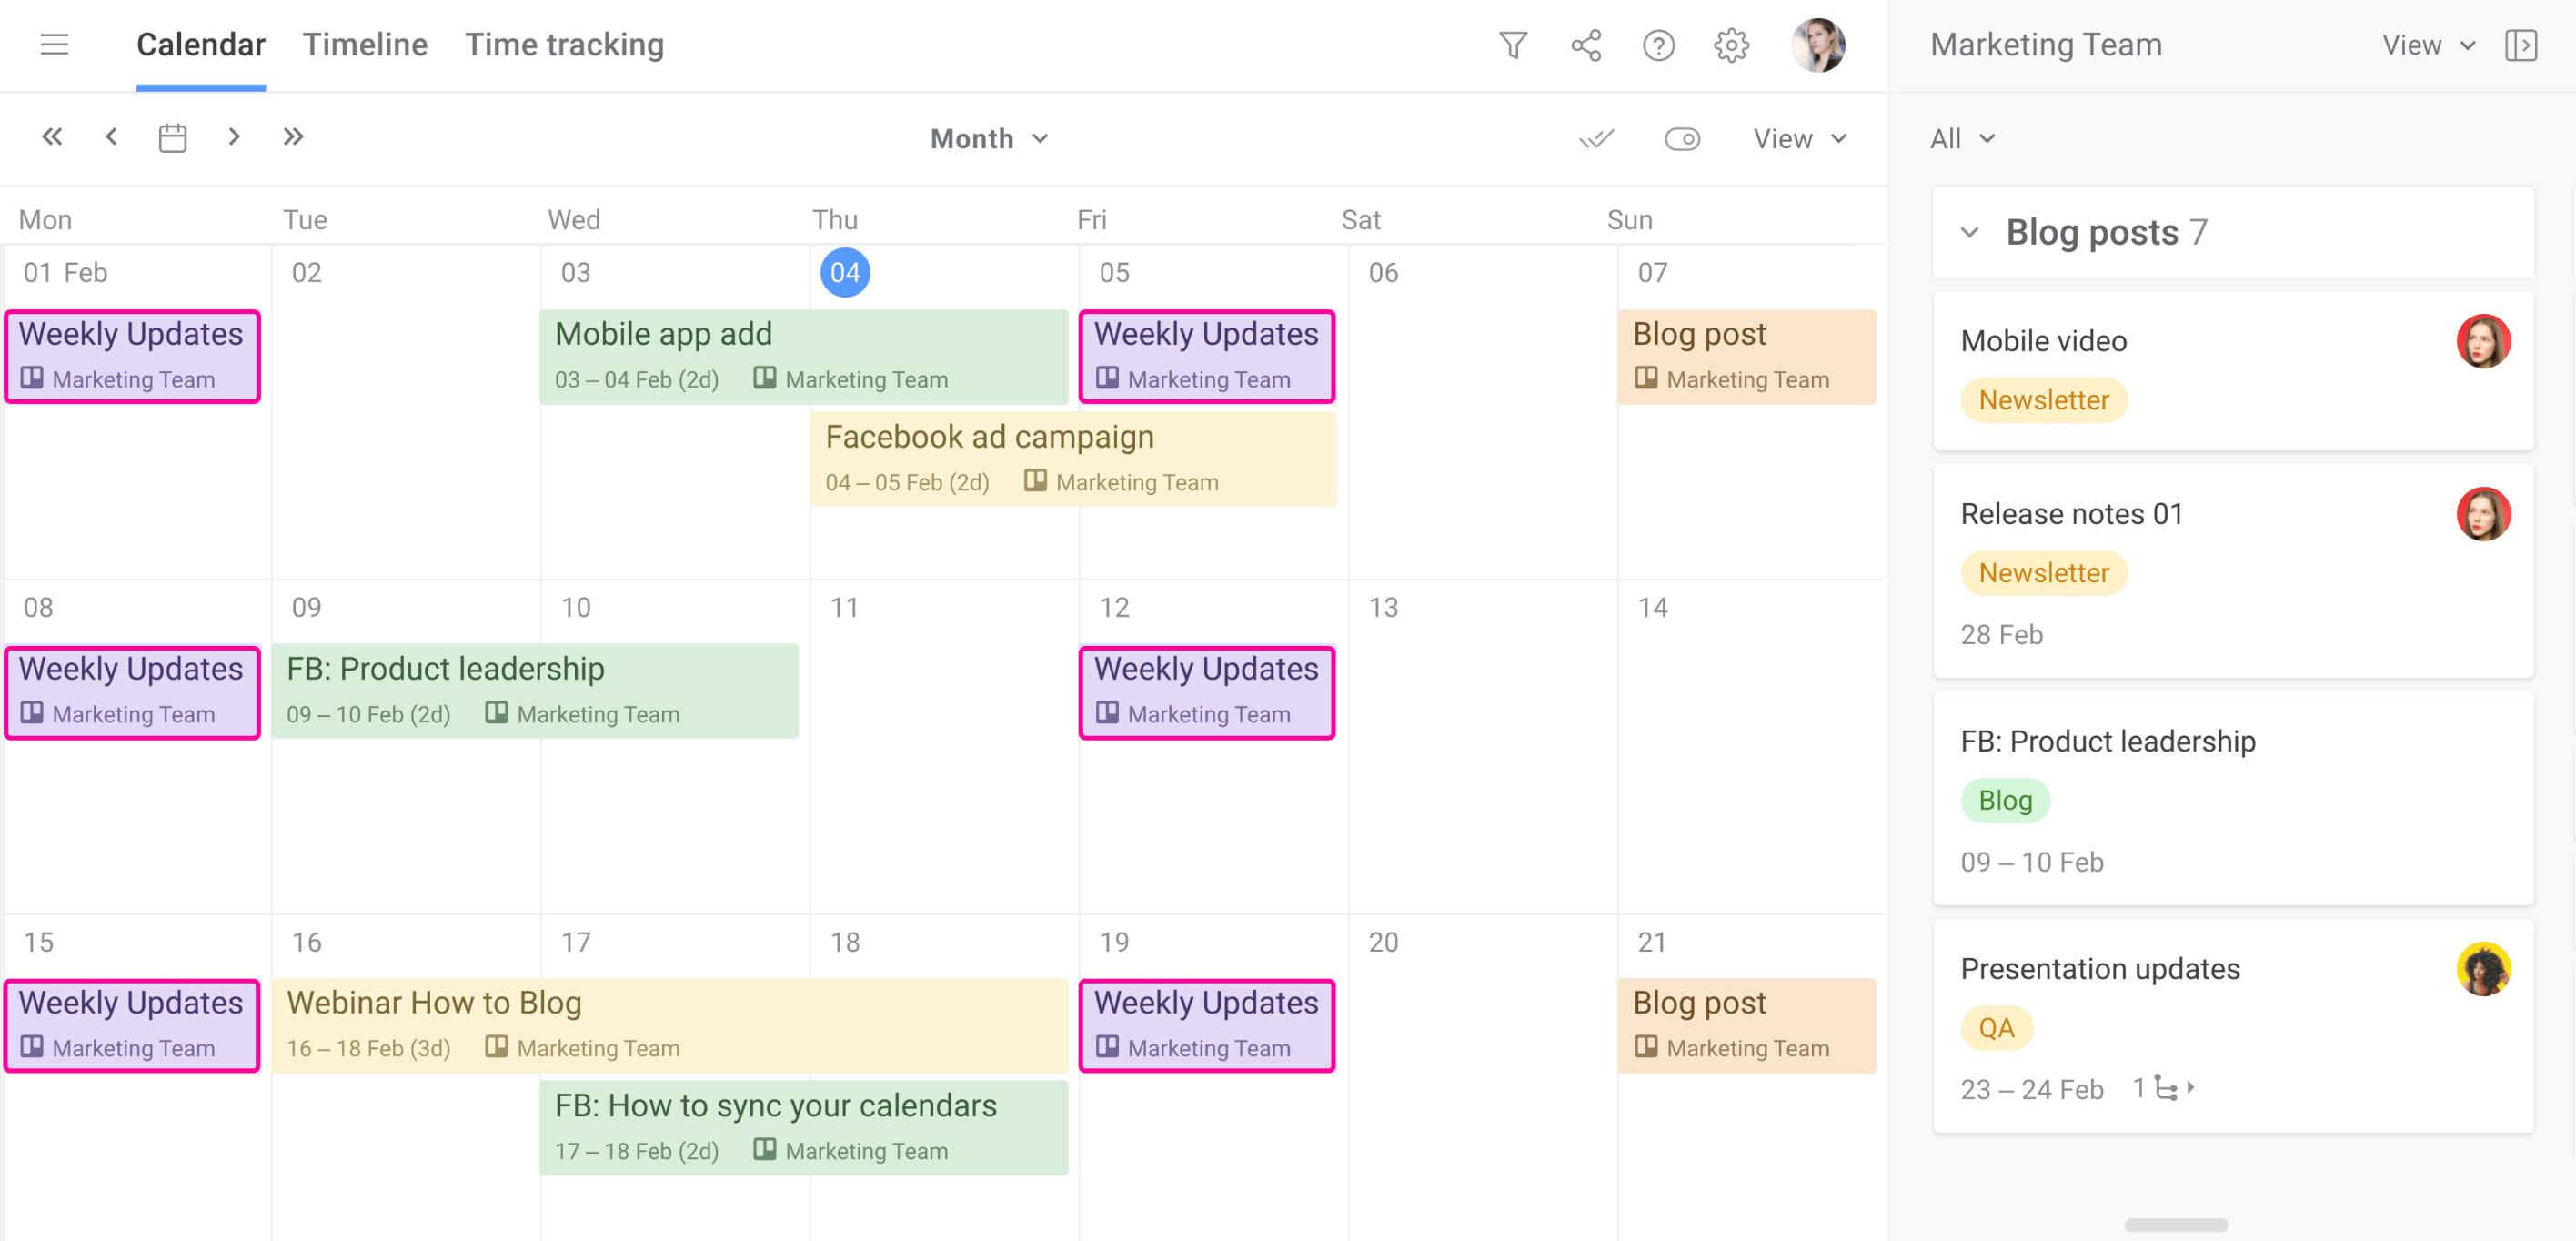 Recurring Tasks in Trello Calendar